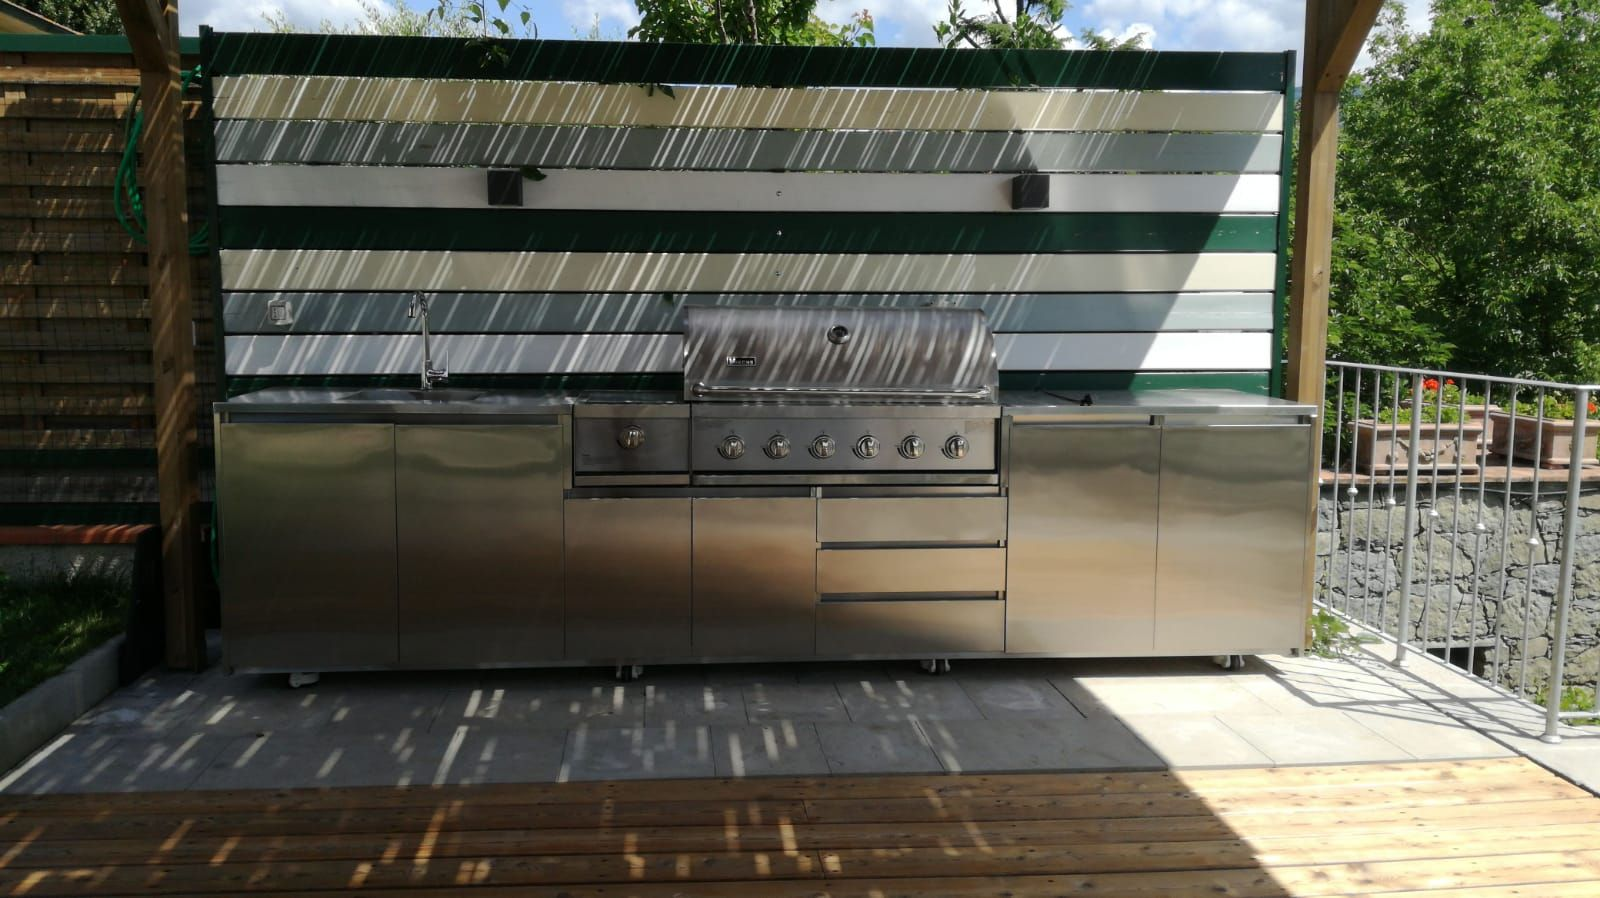 Outdoor Stainless Steel Portable Garden Kitchen Cabinet Stainless Steel Kitchen Cabinets Outdoor Outdoor Kitchen Cabinets